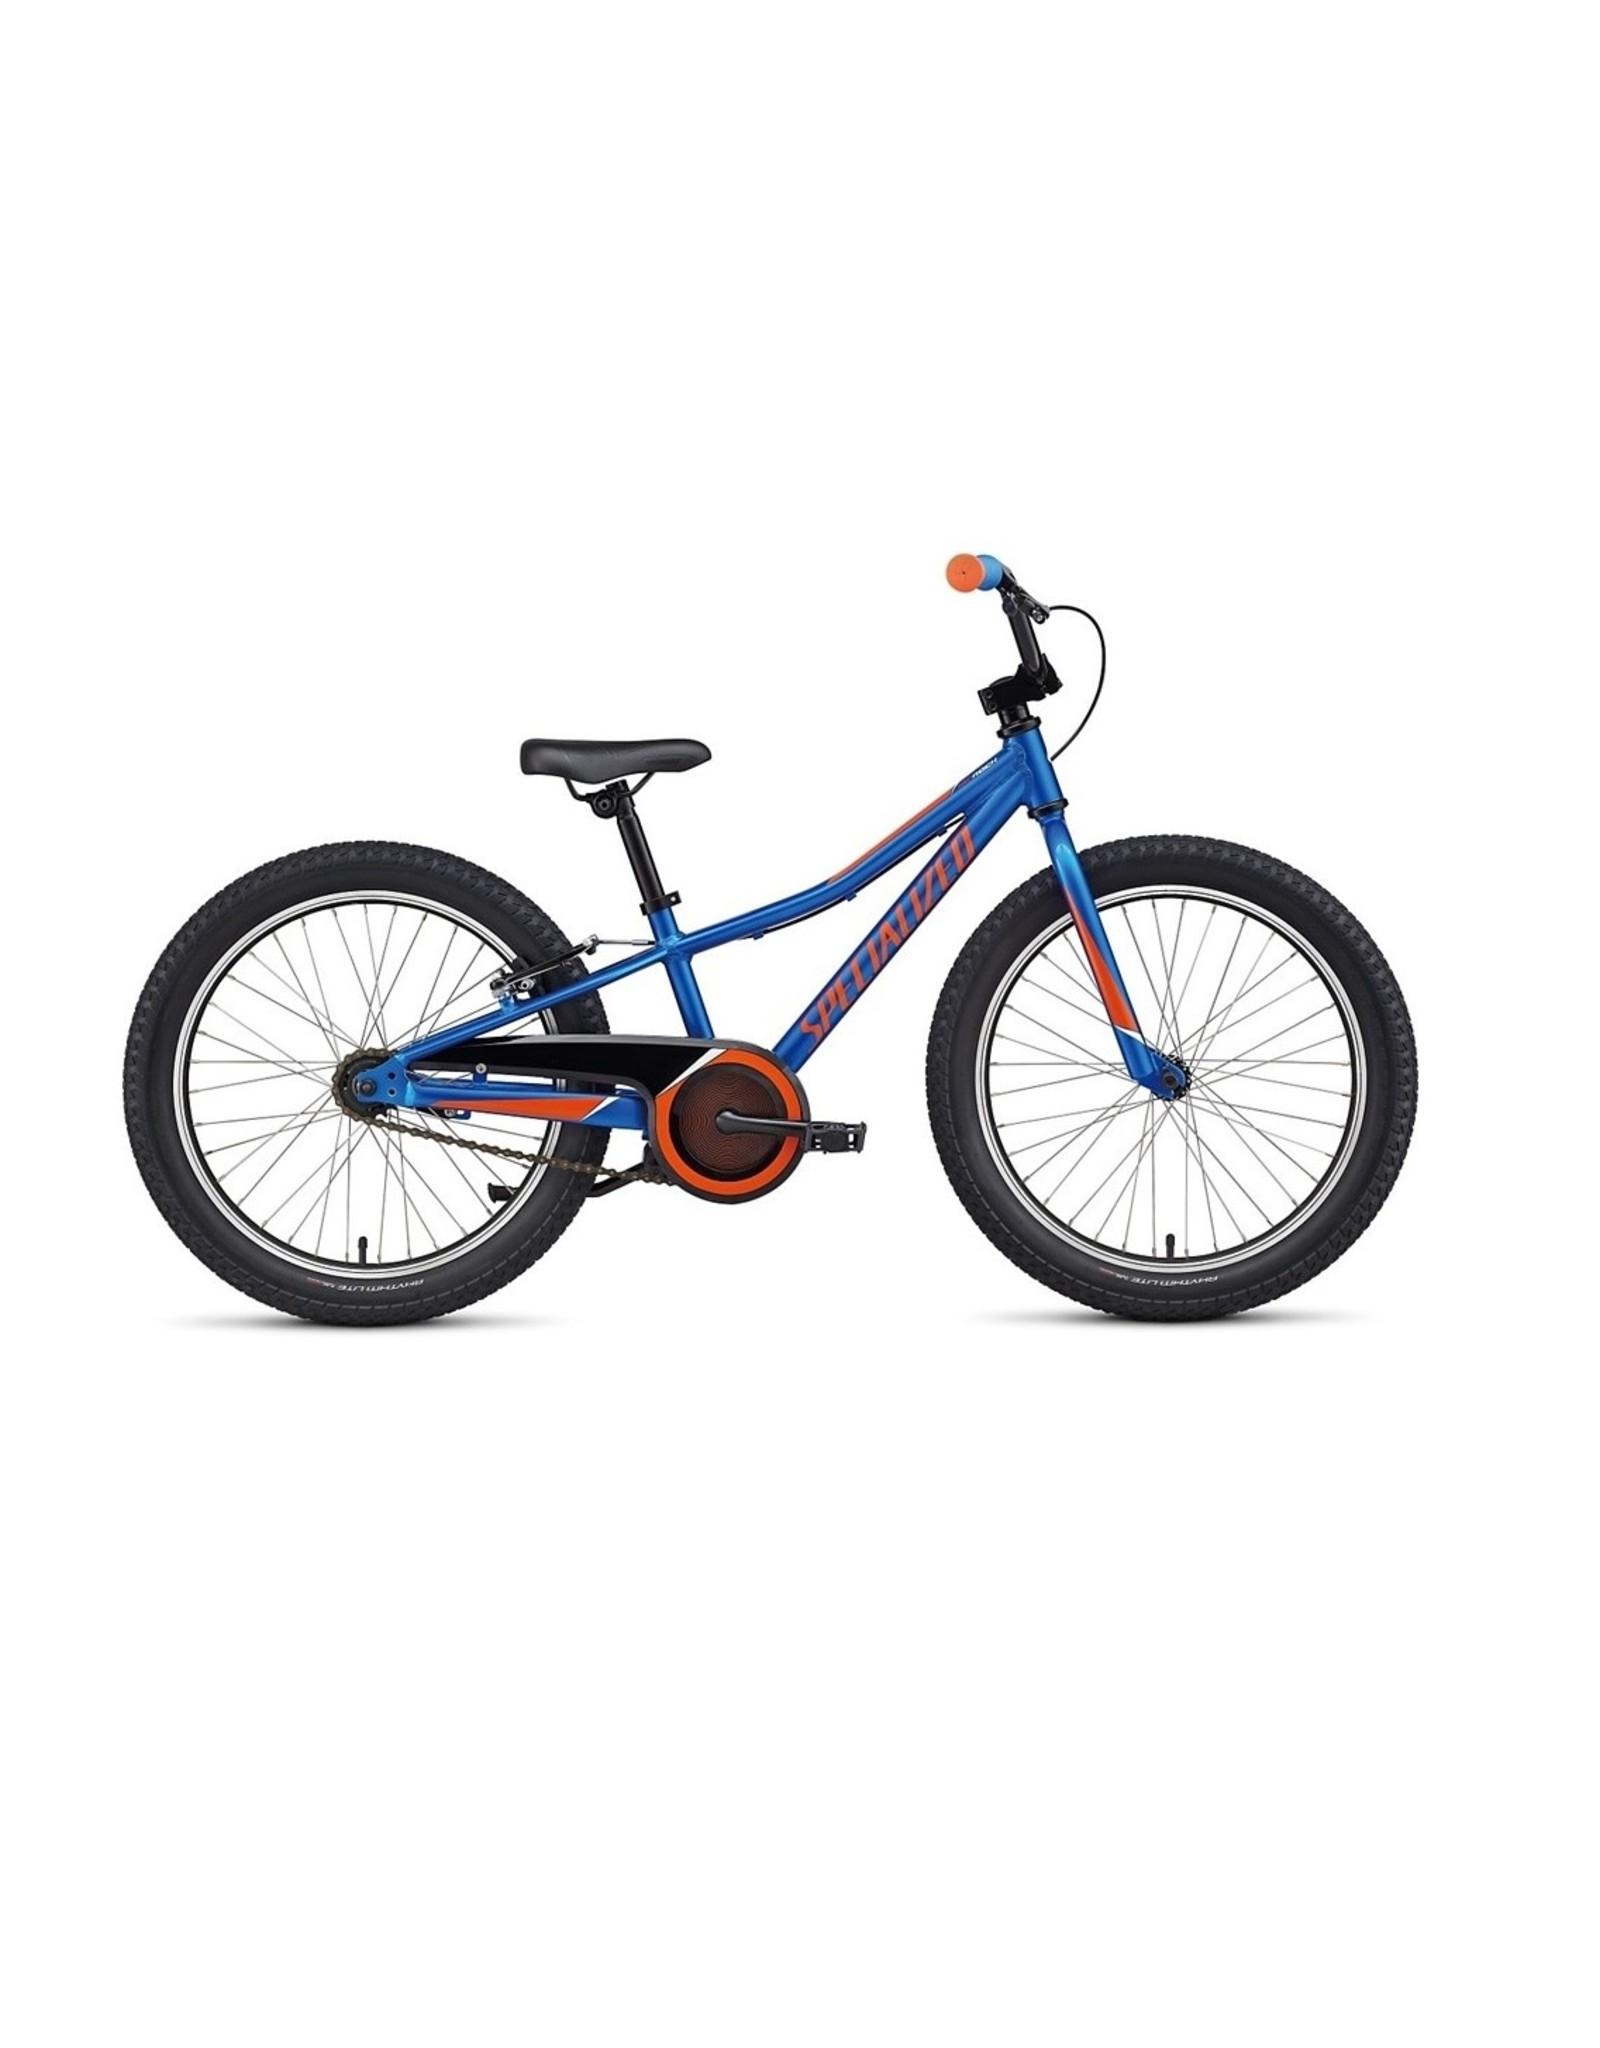 "Specialized Specialized Riprock Coaster 20"" Royal Blue / Orange Bicycle"